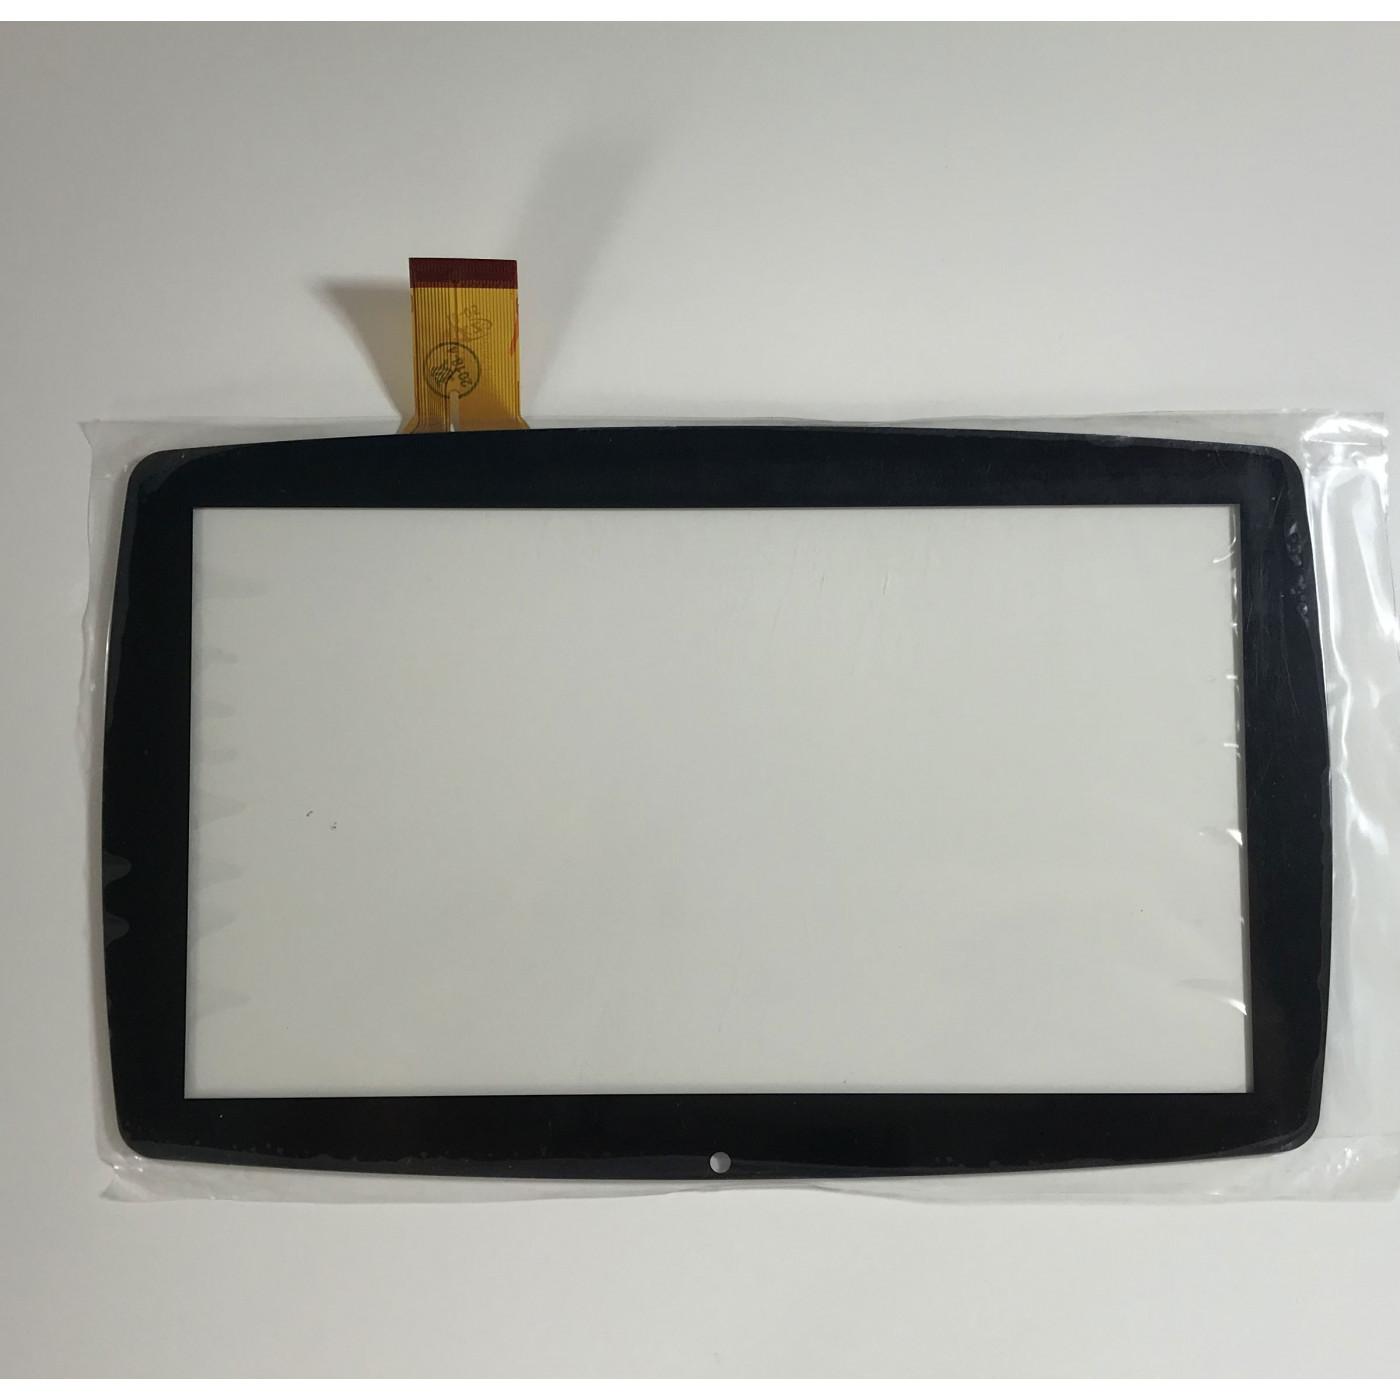 TOUCH SCREEN Lisciani MIO TAB SMART KID MP0100884 HD Tablet VETRO 7.0